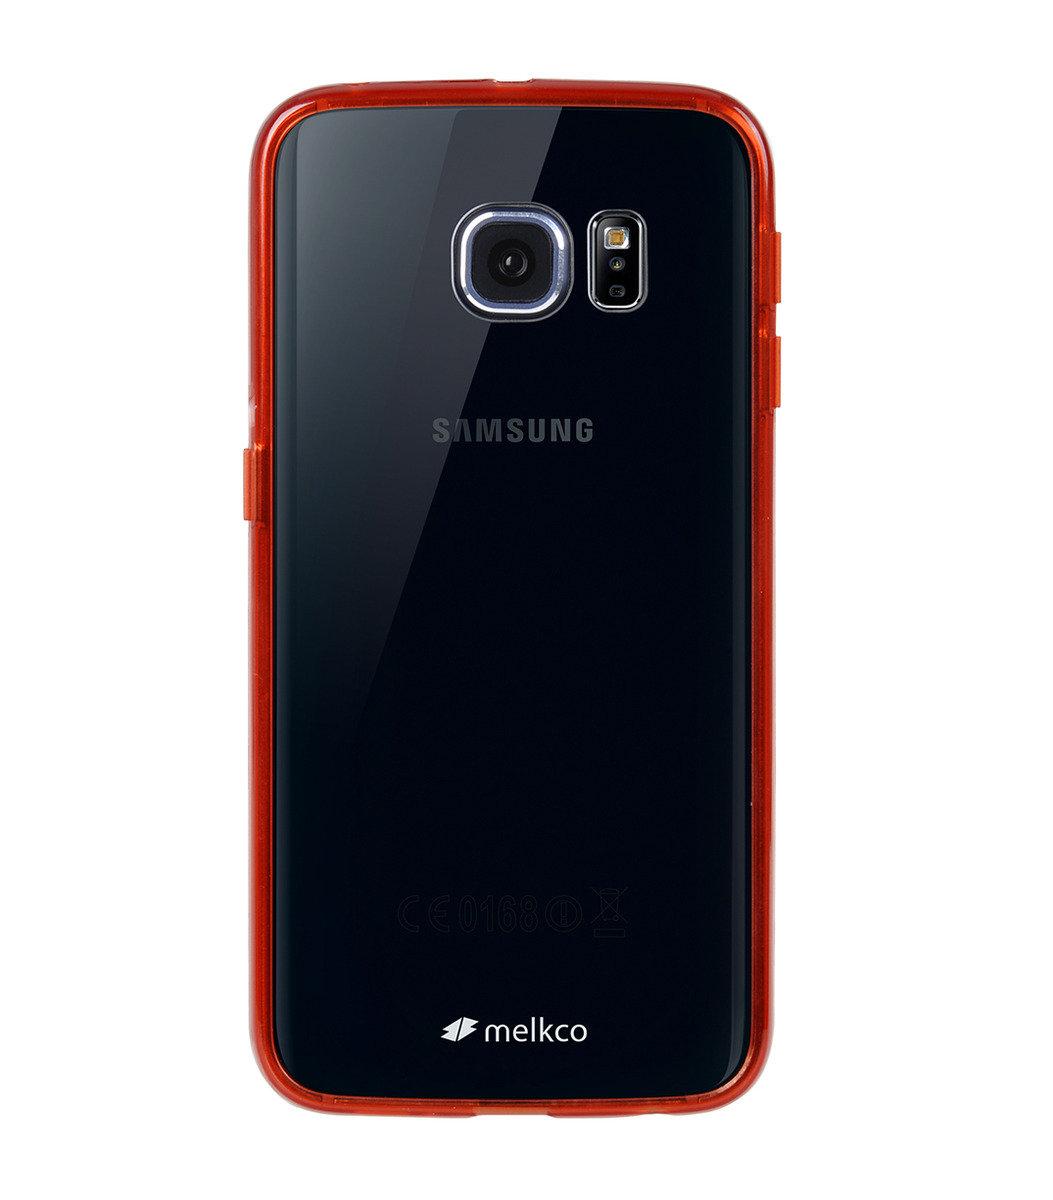 Galaxy S6 Edge PolyUltima手機保護殼 - 透明紅色(附送屏幕保護貼)